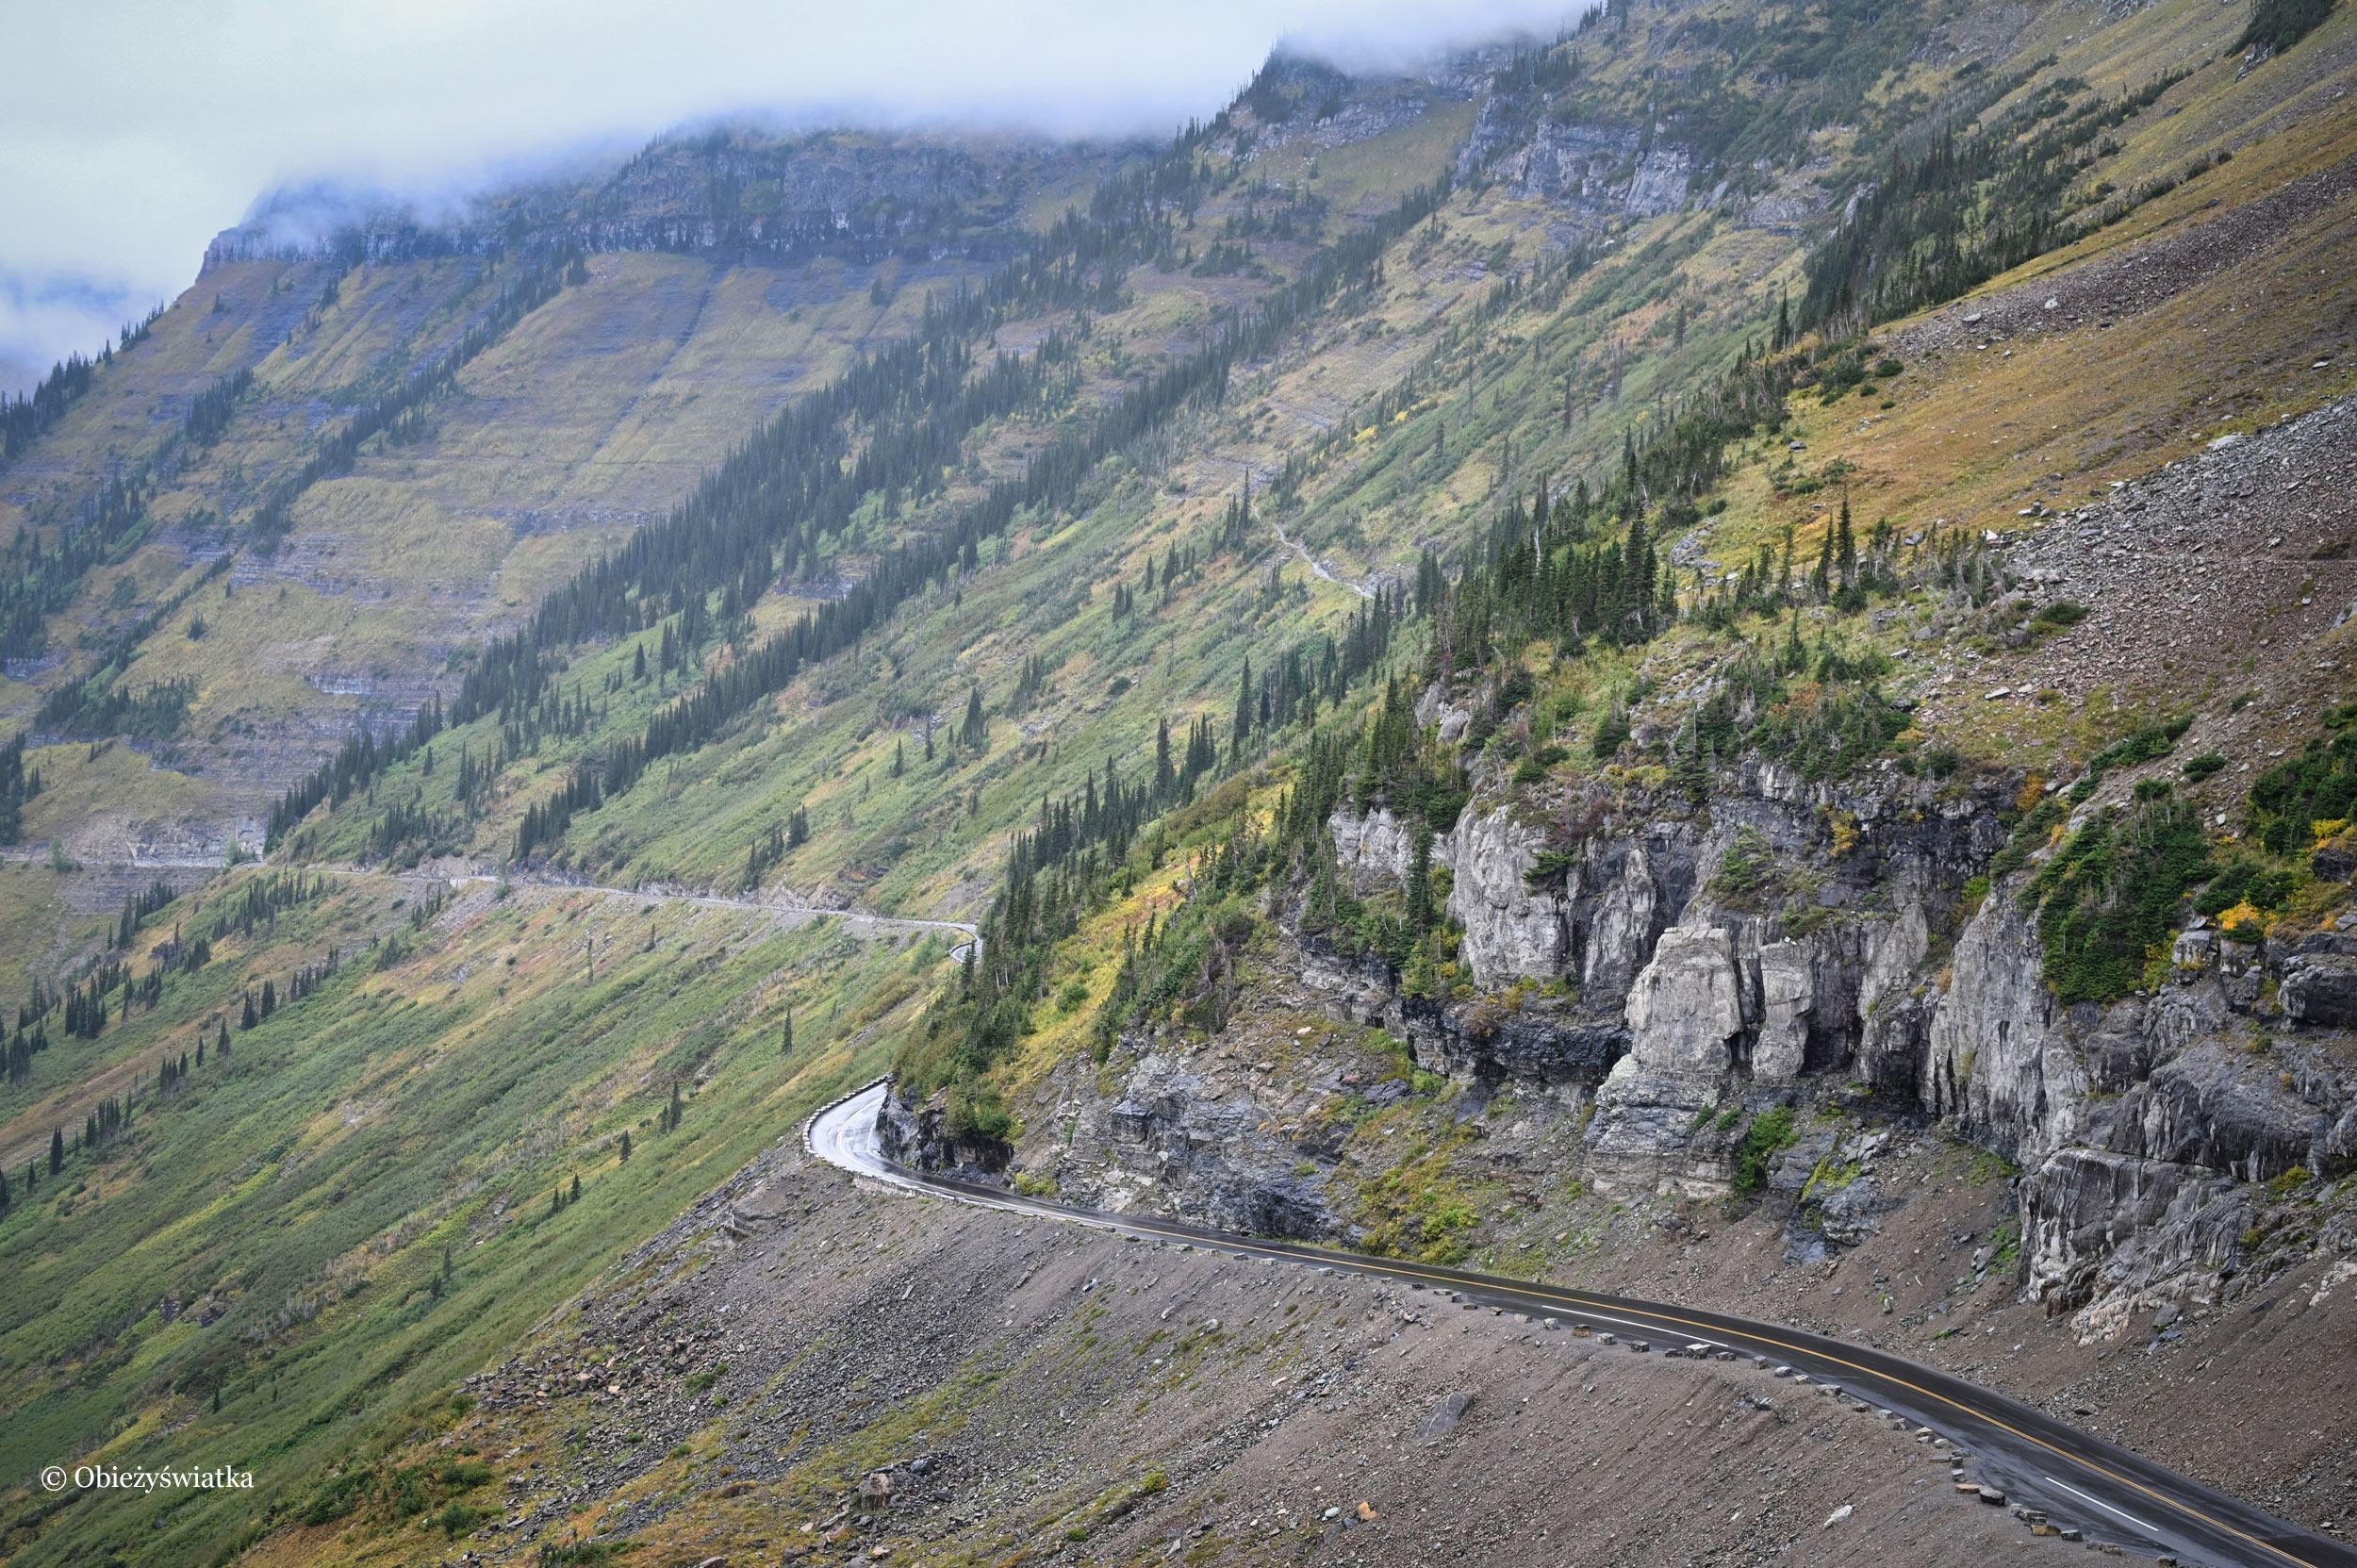 Deszczowo, Rocky Mountains, Glacier National Park, USA